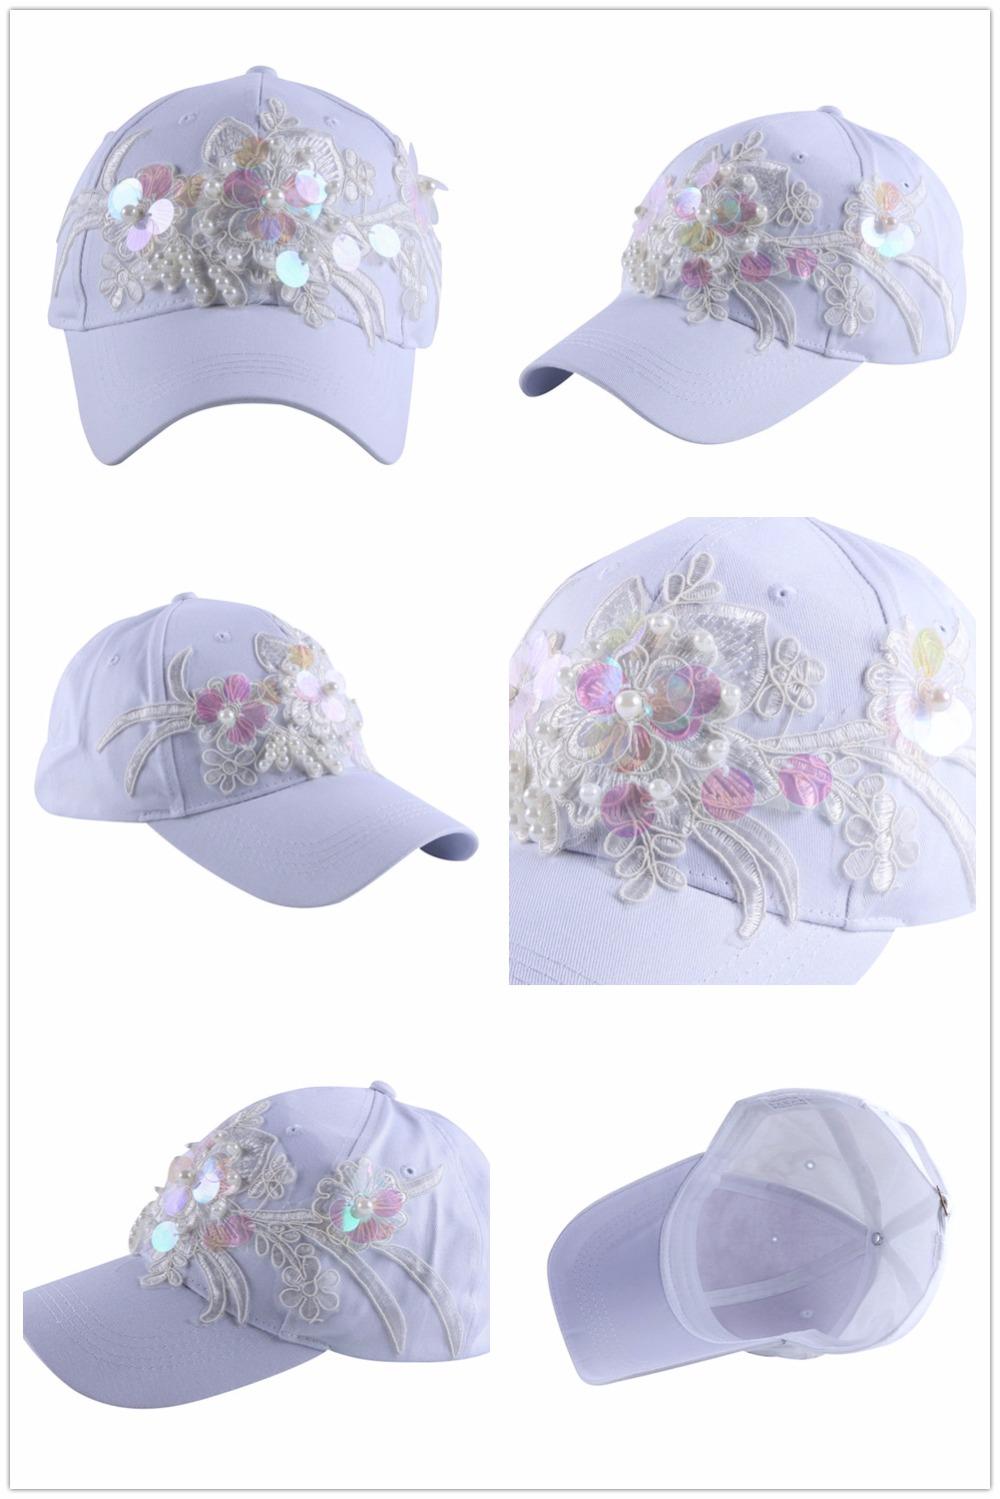 High Quality WOMEN brand baseball cap new fashion rhinestone crystal denim snapback caps wholesale woman hip hop snapbacks hats 8